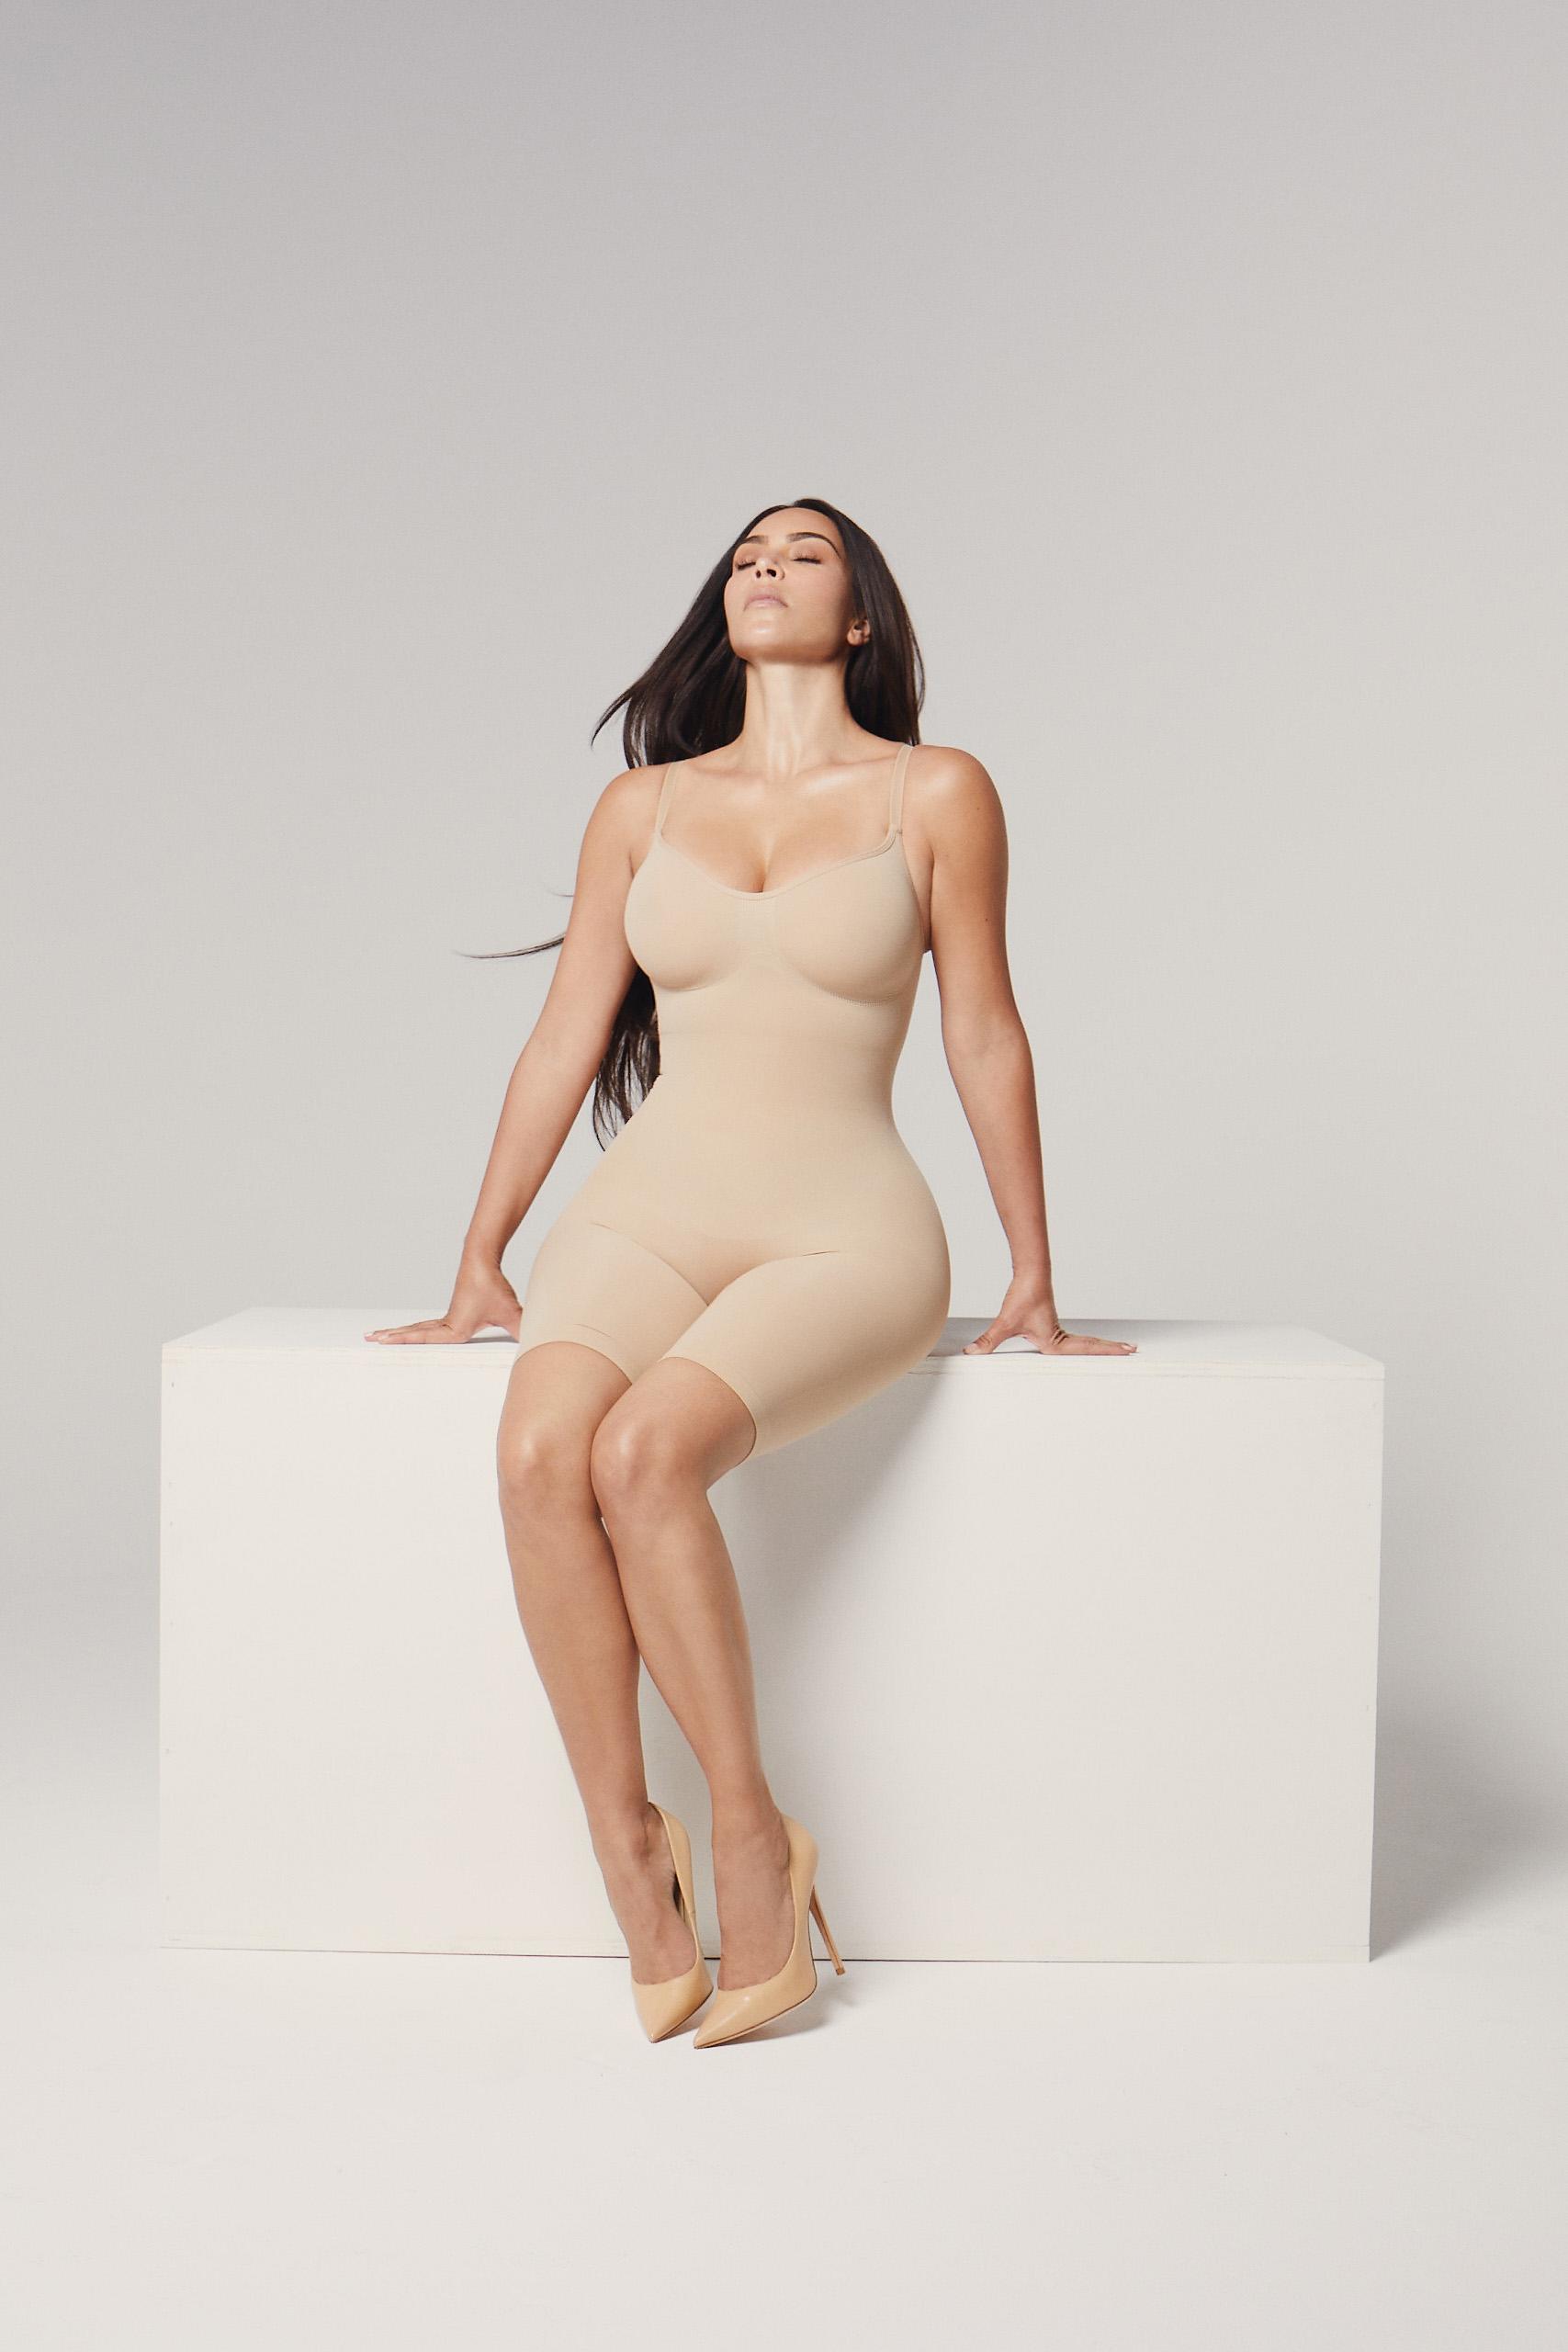 Kim Kardashian West shot by Vanessa Beecroft for Selfridges